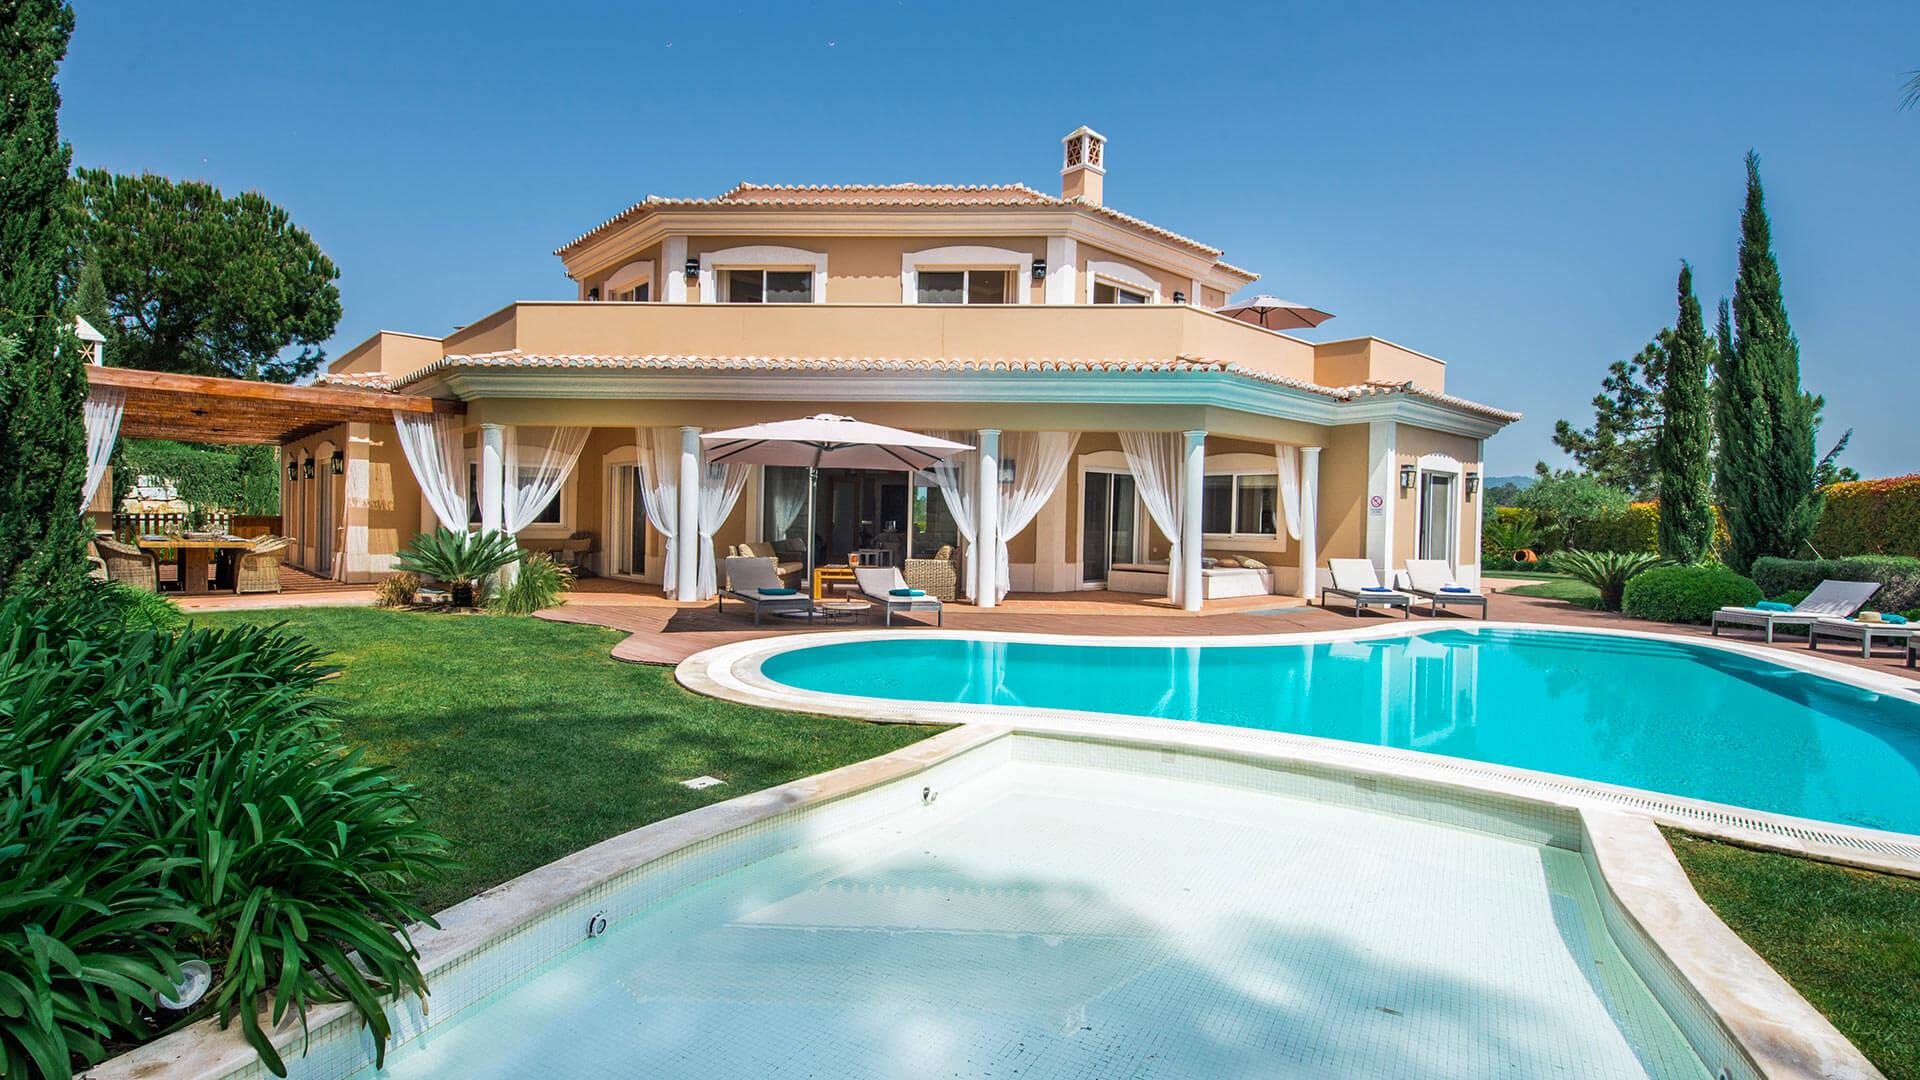 villa onix villa mieten in algarve quinta do lago villanovo. Black Bedroom Furniture Sets. Home Design Ideas